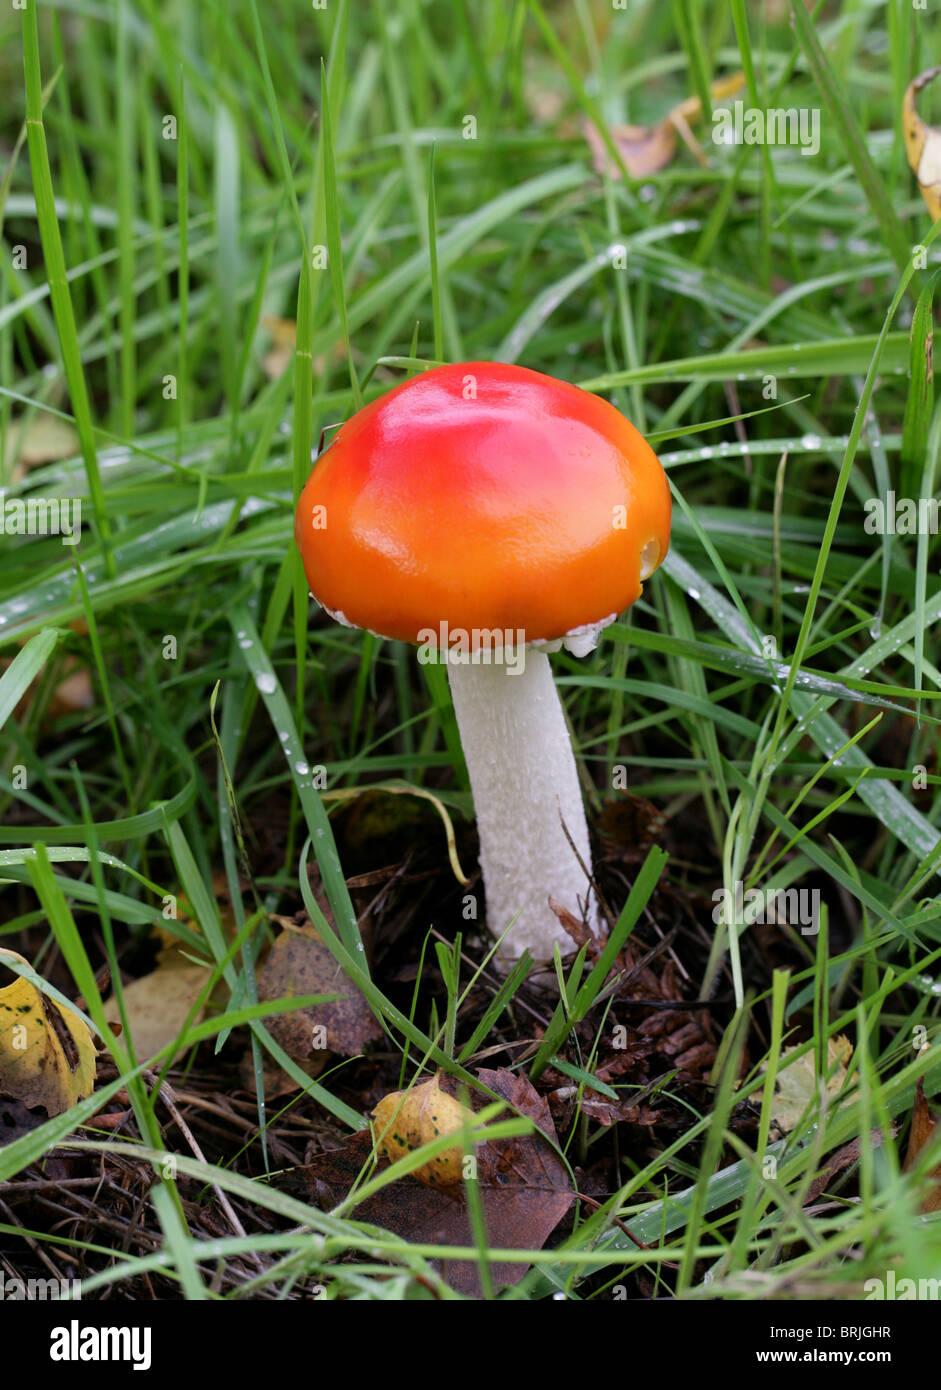 Fliegenpilz, Fliegenpilz, Amanita Muscaria var. Aureola, Amanitaceae. Stockbild